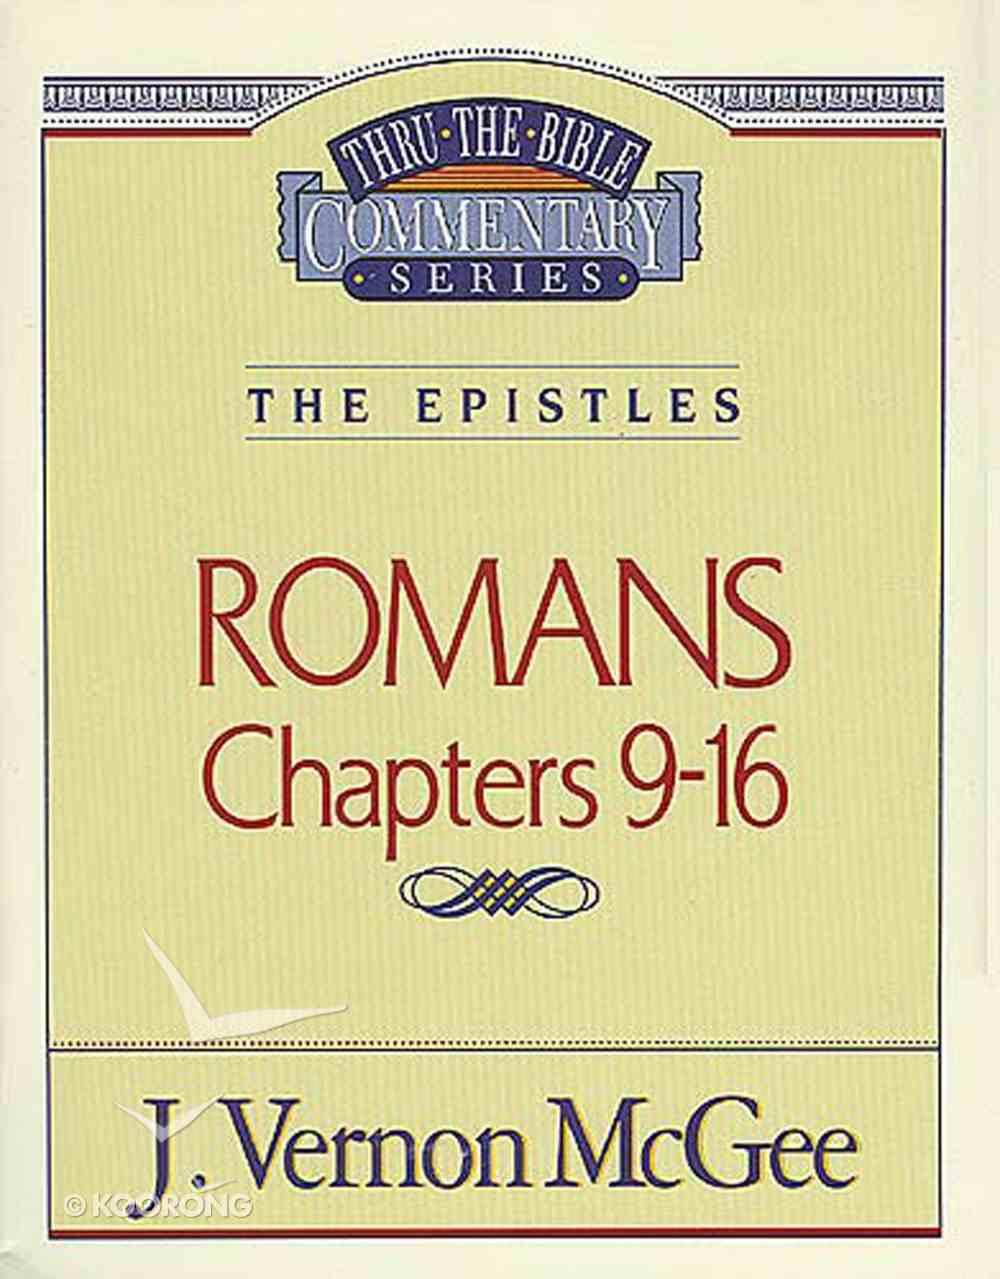 Thru the Bible NT #43: Romans (Volume 2) (#43 in Thru The Bible New Testament Series) eBook